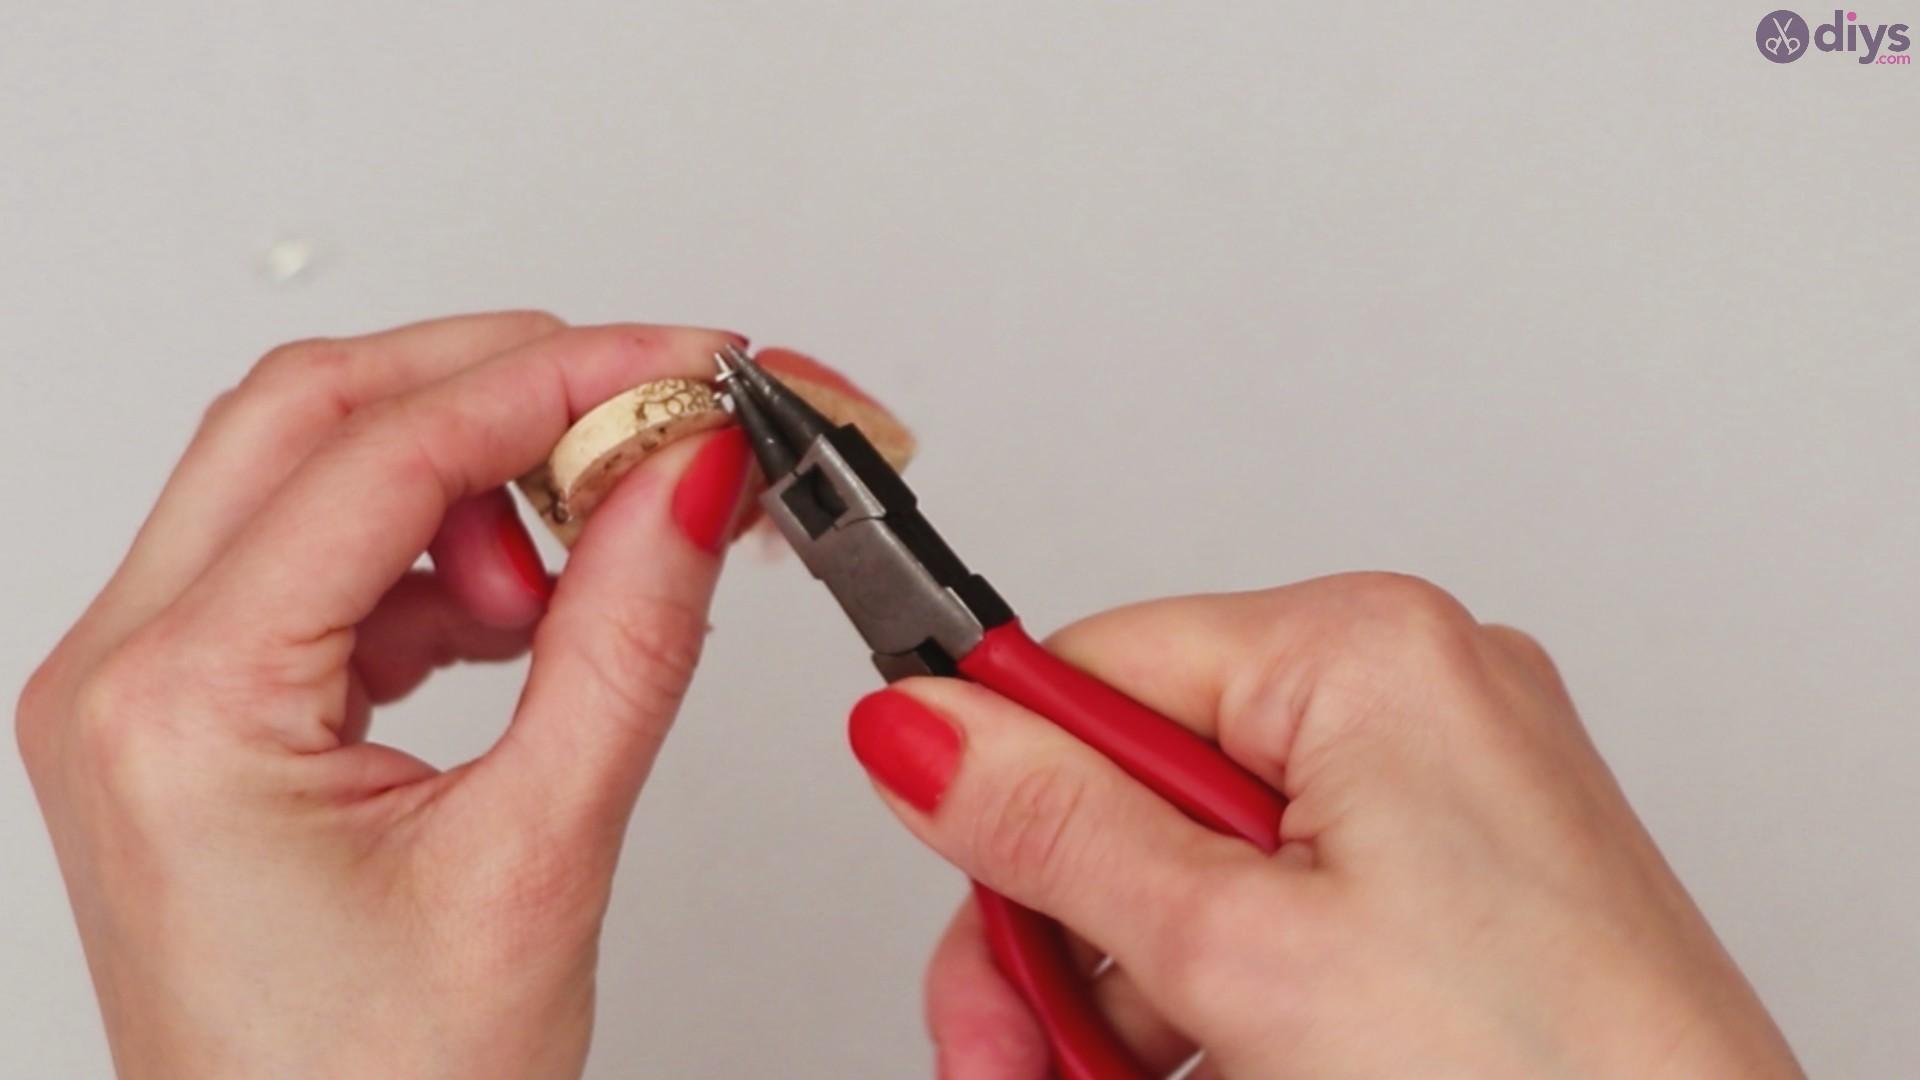 Diy wine cork necklace (41)